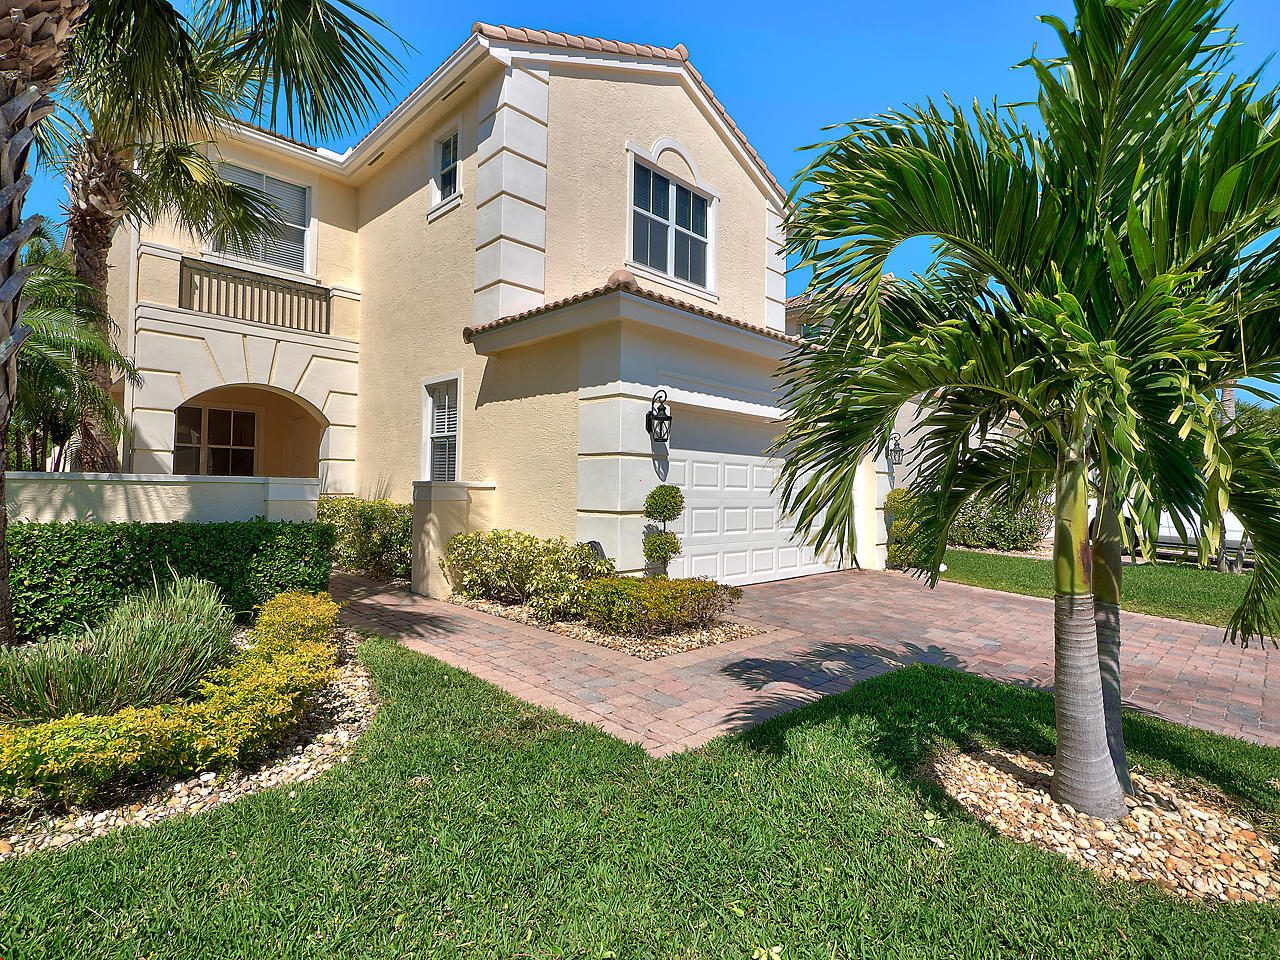 Listing: 203 Isle Verde Way, Palm Beach Gardens, FL.| MLS# RX ...